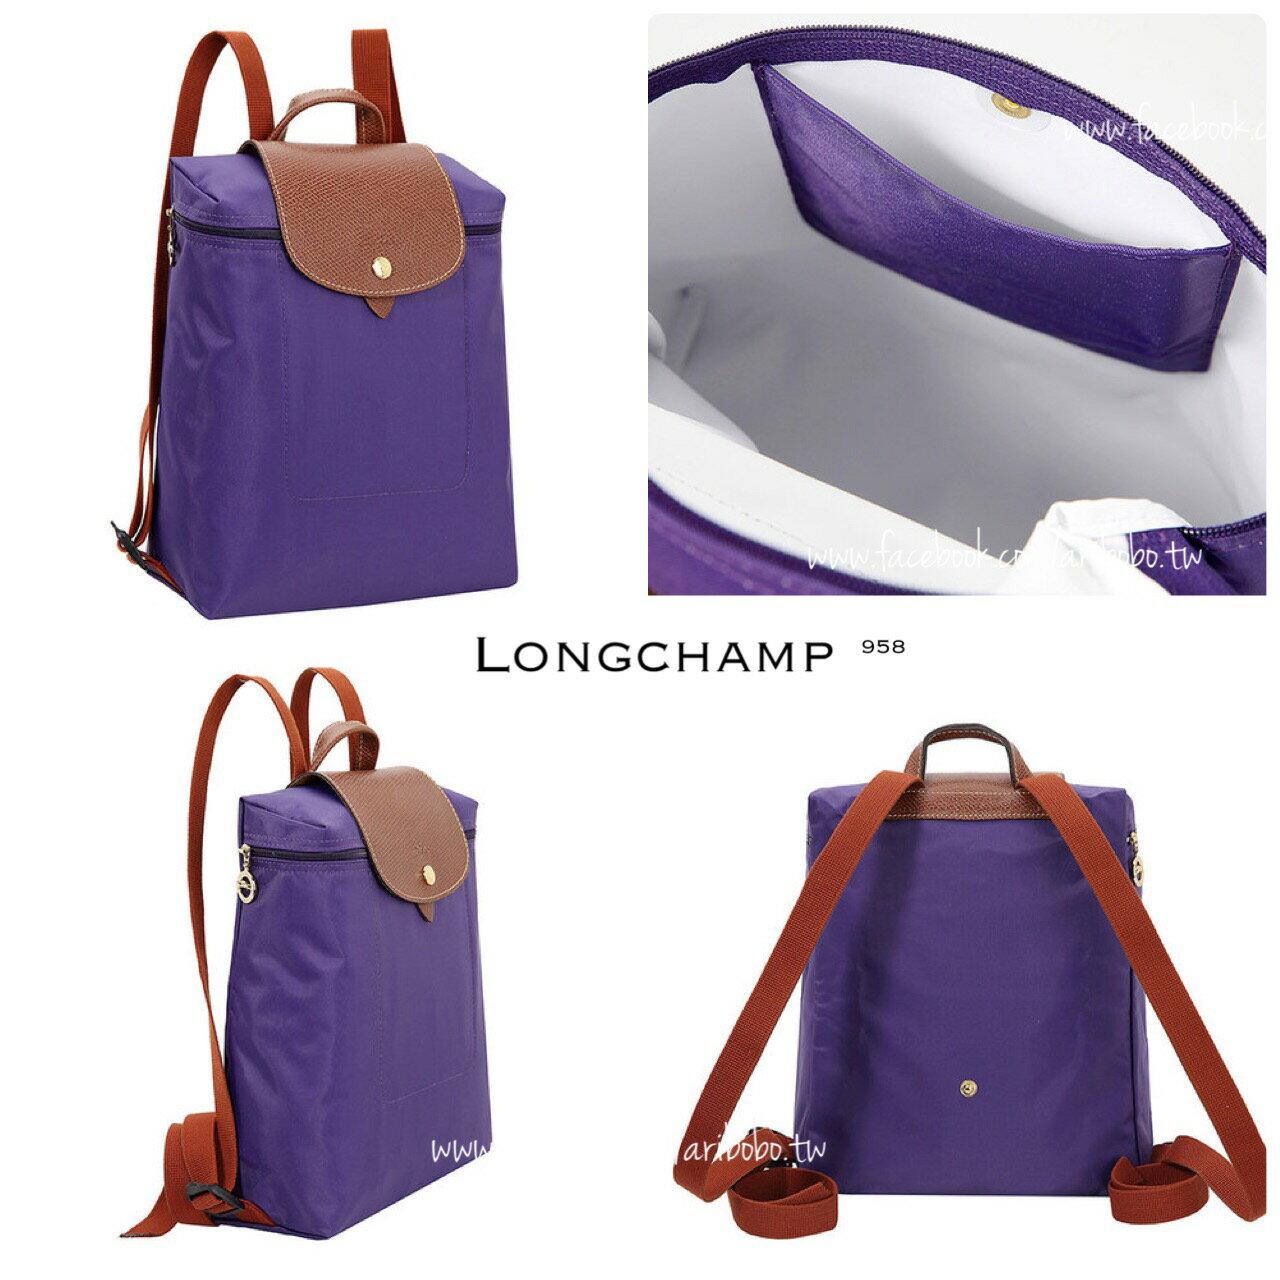 【LONGCHAMP】 LE PLIAGE 水晶紫折疊後背包 2